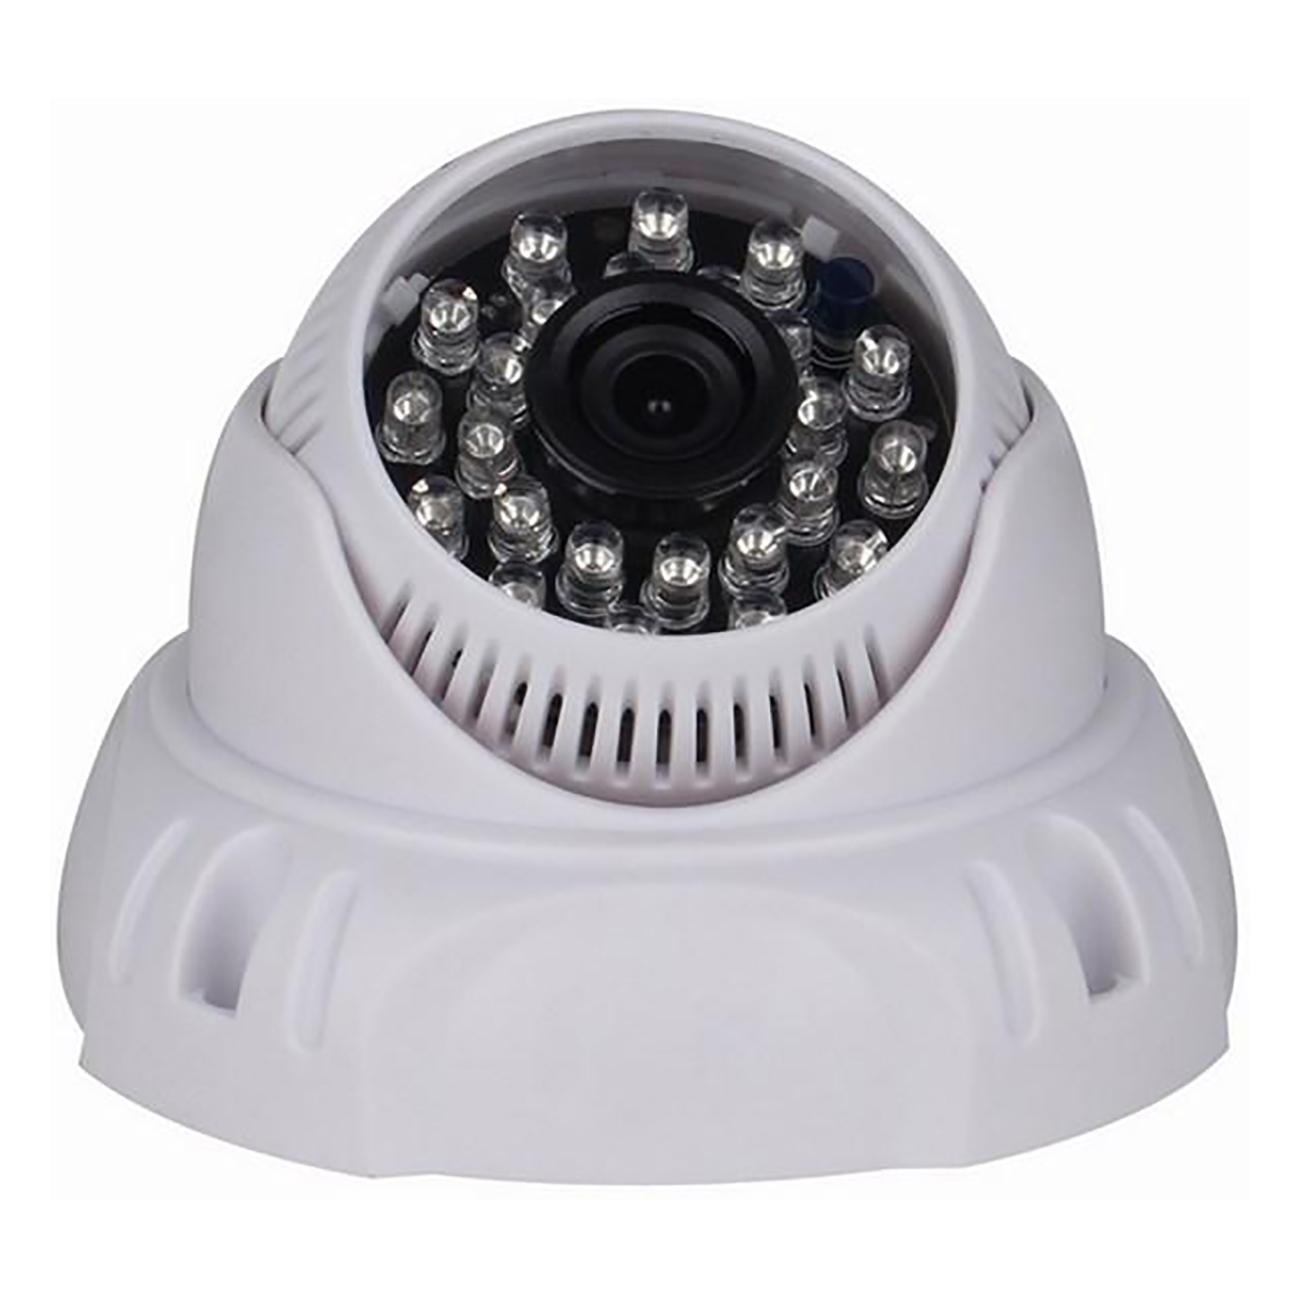 Фото Купольная камера AHD Rexant 2.1 Мп Full HD Rexant (1080P), ИК до 20 м {45-0263} (1)